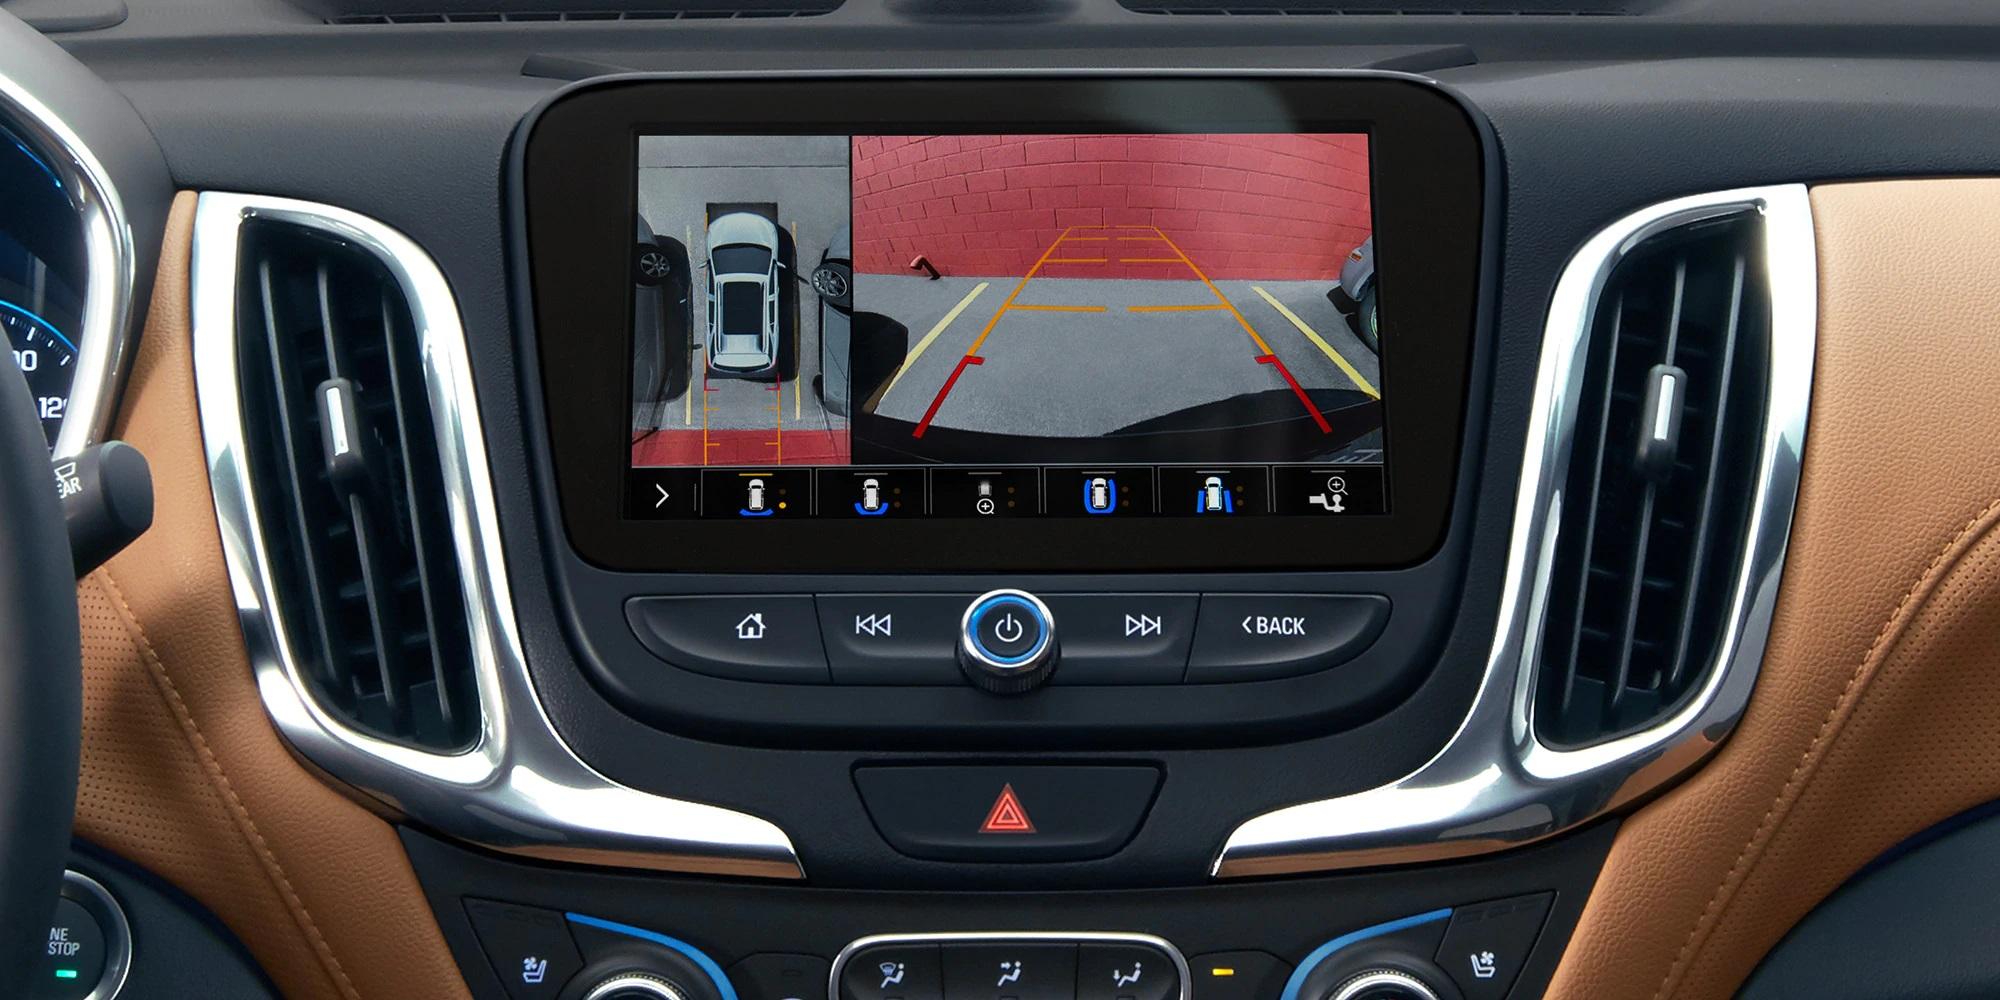 2020 Chevrolet Equinox Touchscreen Display